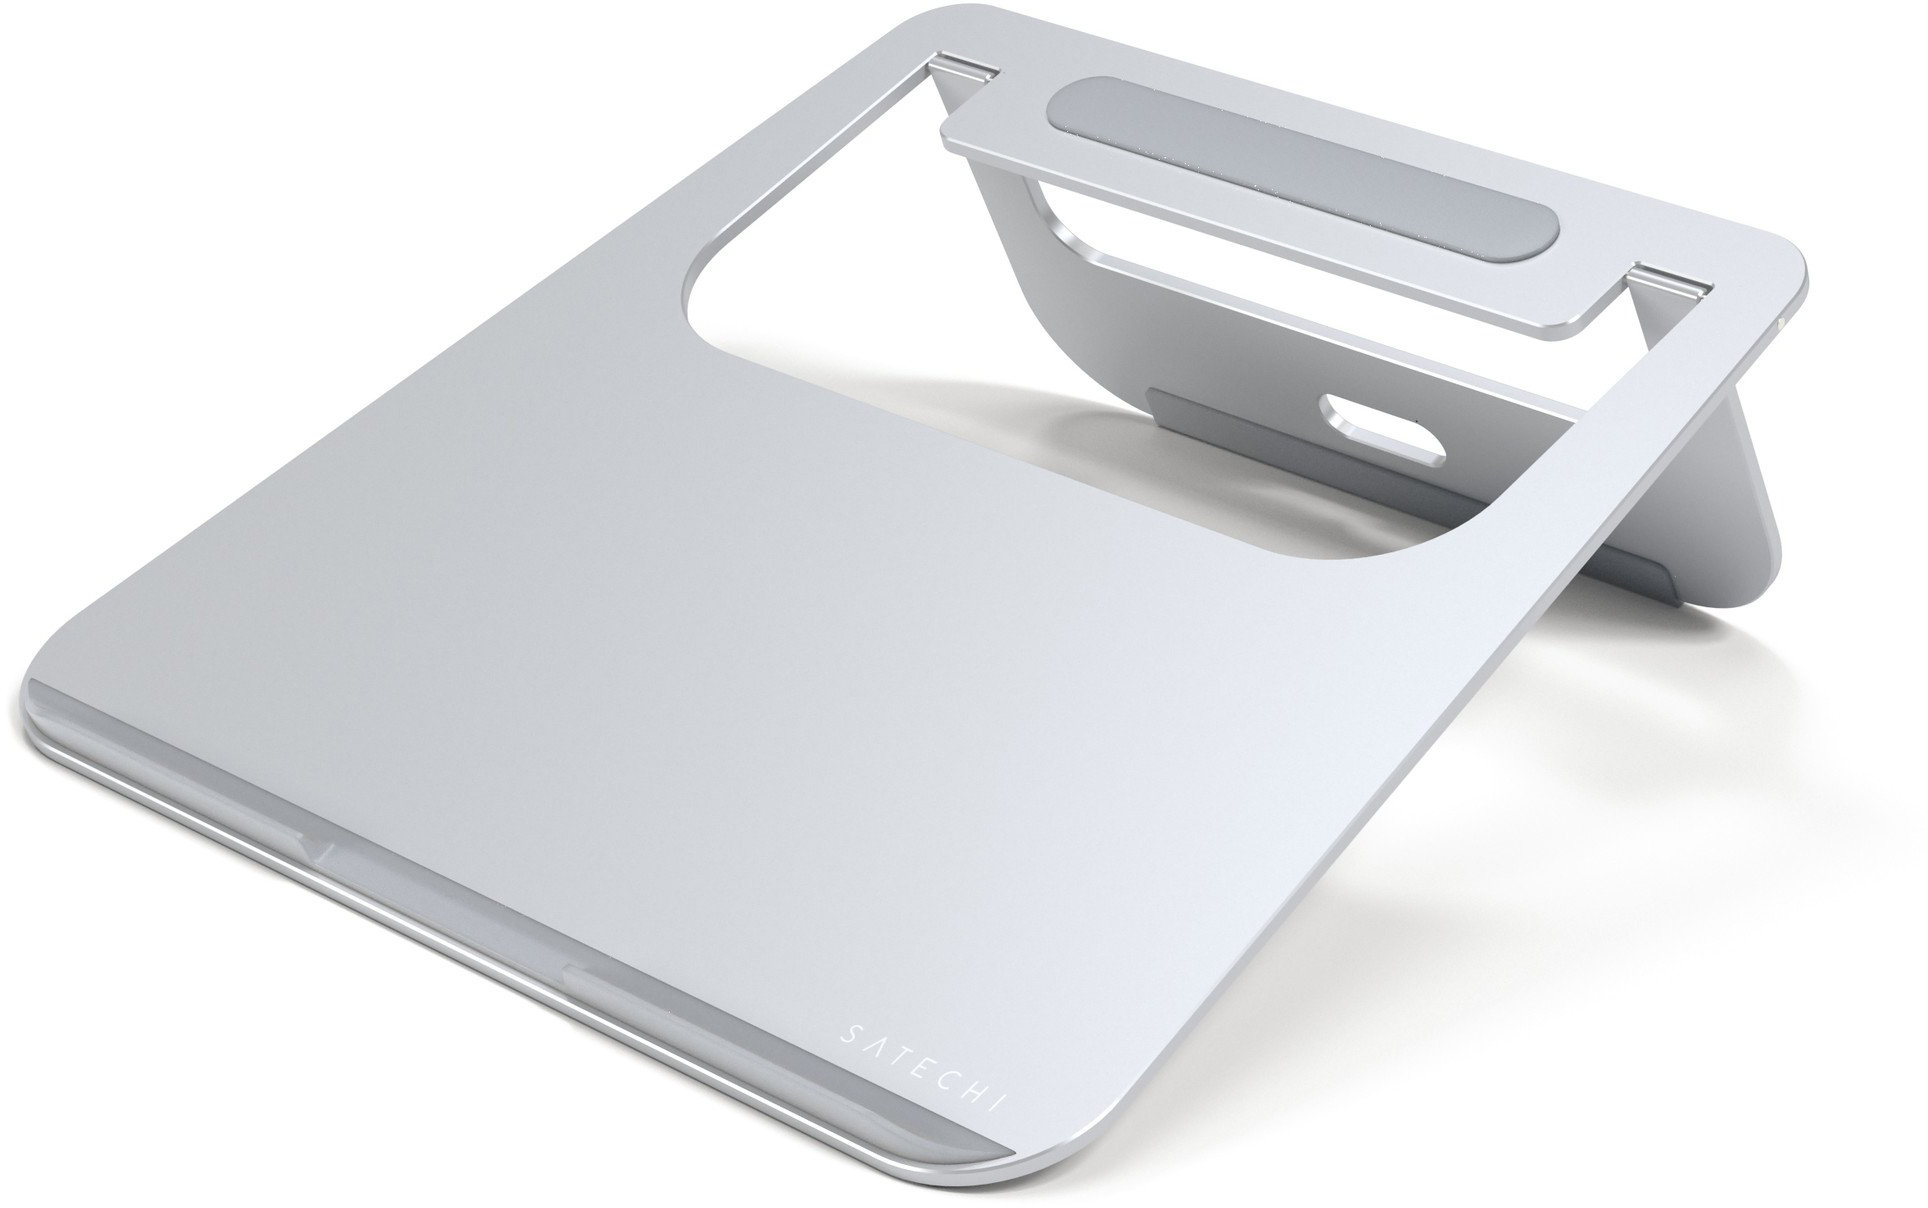 все цены на Подставка Satechi Aluminum ST-ALTSS для ноутбука (Silver) онлайн